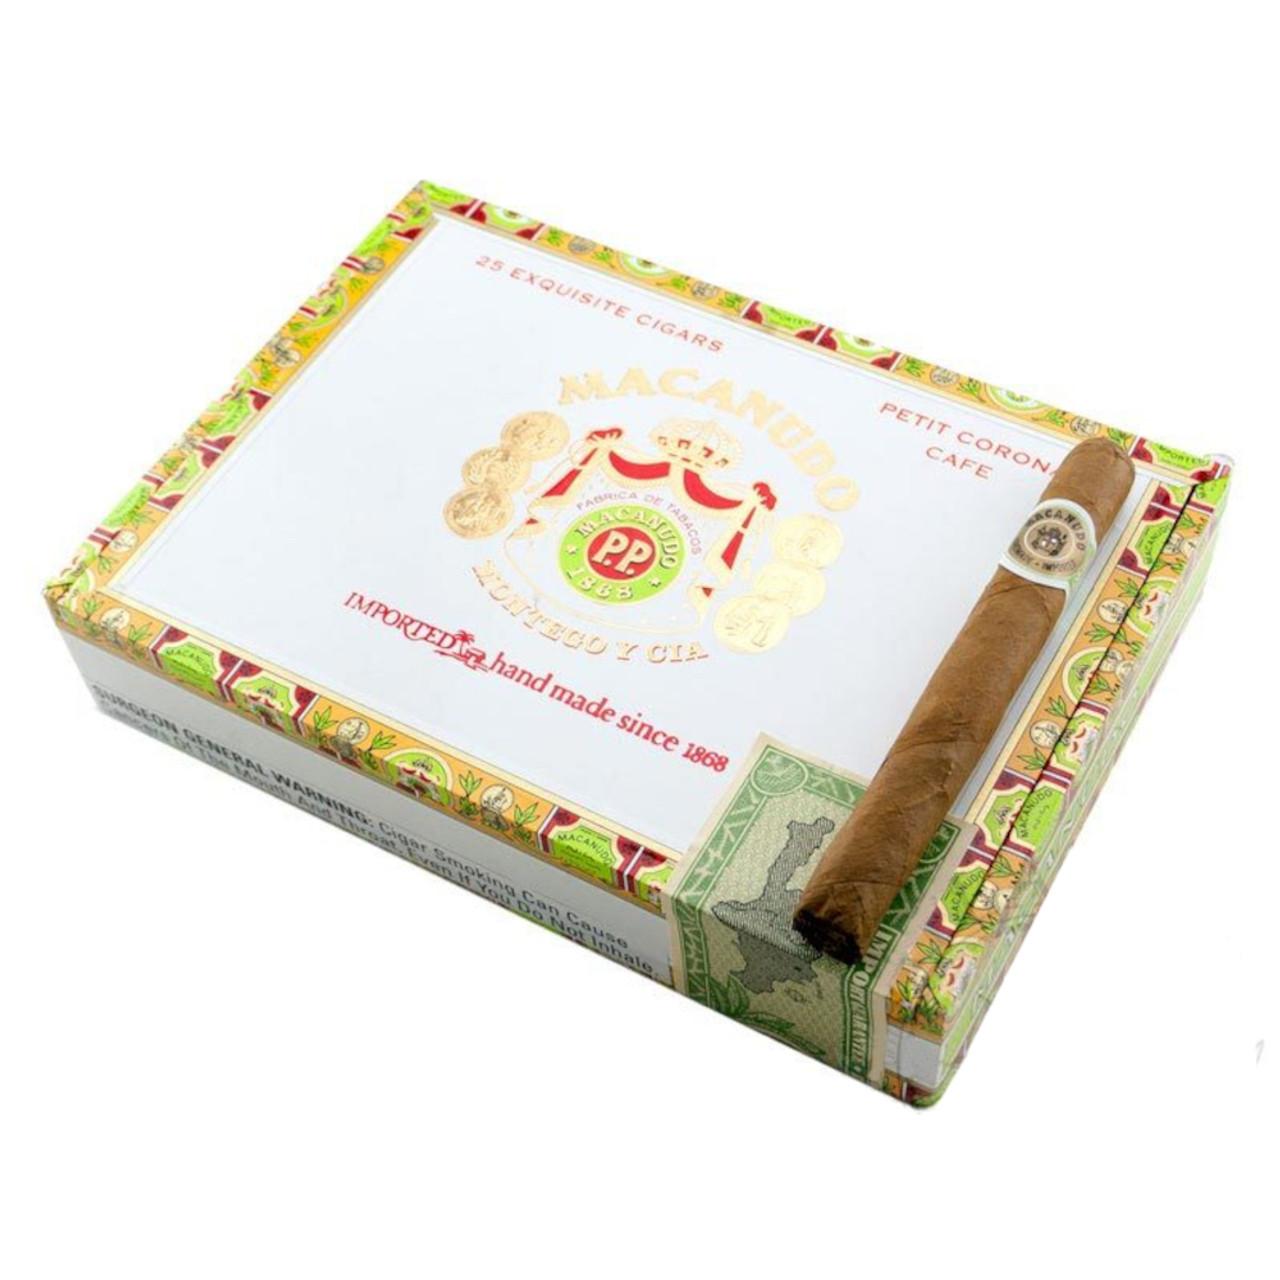 DISCOUNT Macanudo Petit Corona Cigars - 5 x 38 (Box of 25)